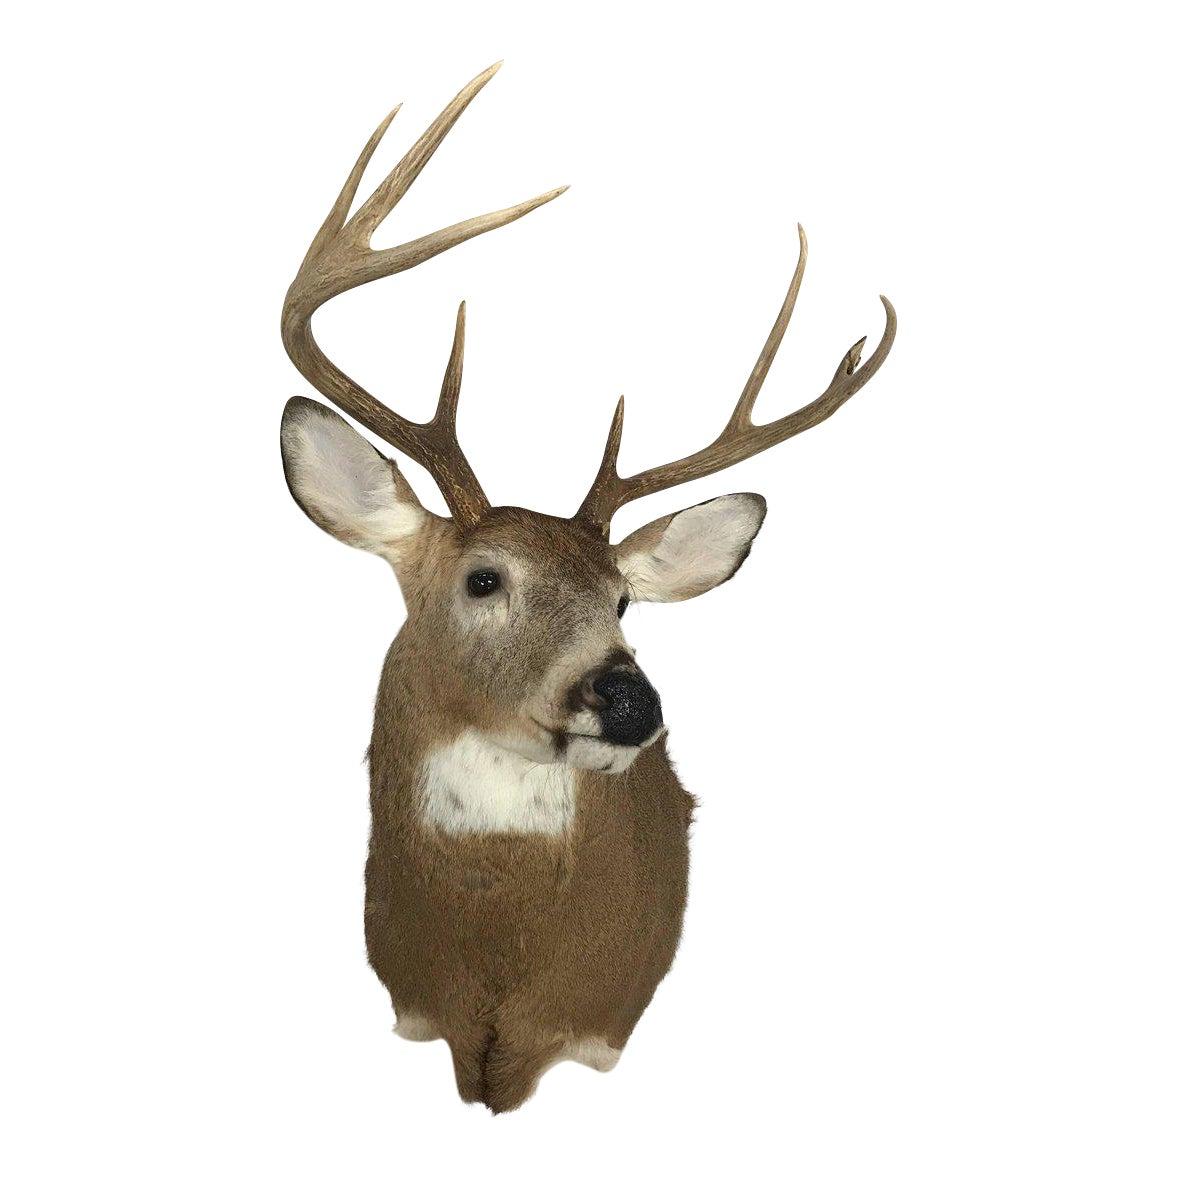 Deer Head Mount >> Exquisite Eight Point Deer Head Taxidermy Mount Decaso